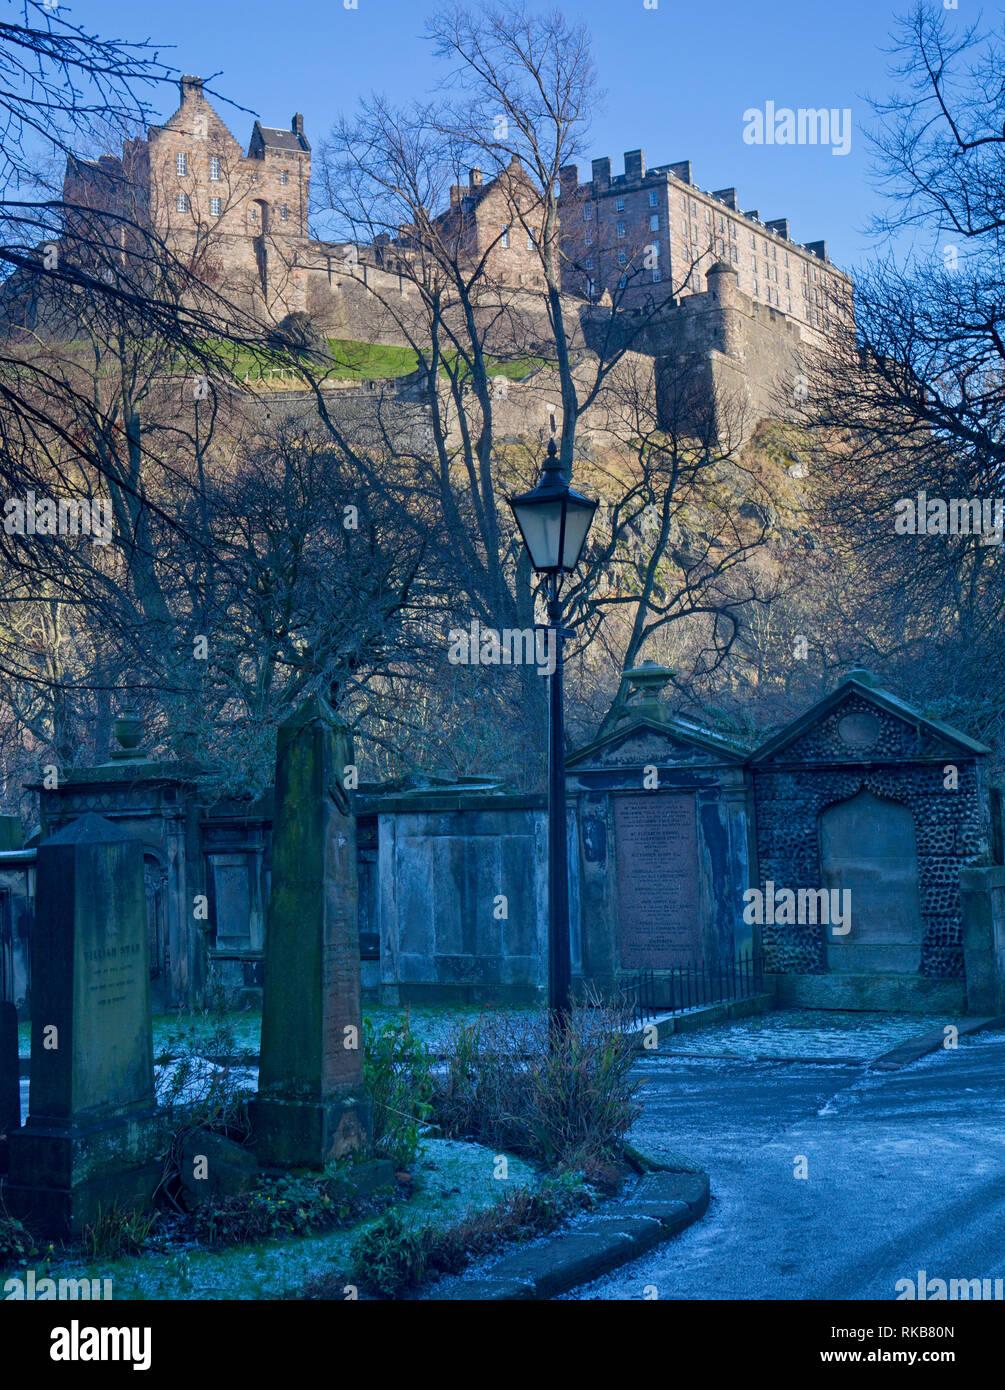 Edinburgh Castle and St Cuthbert's graveyard, Edinburgh, Scotland - Stock Image